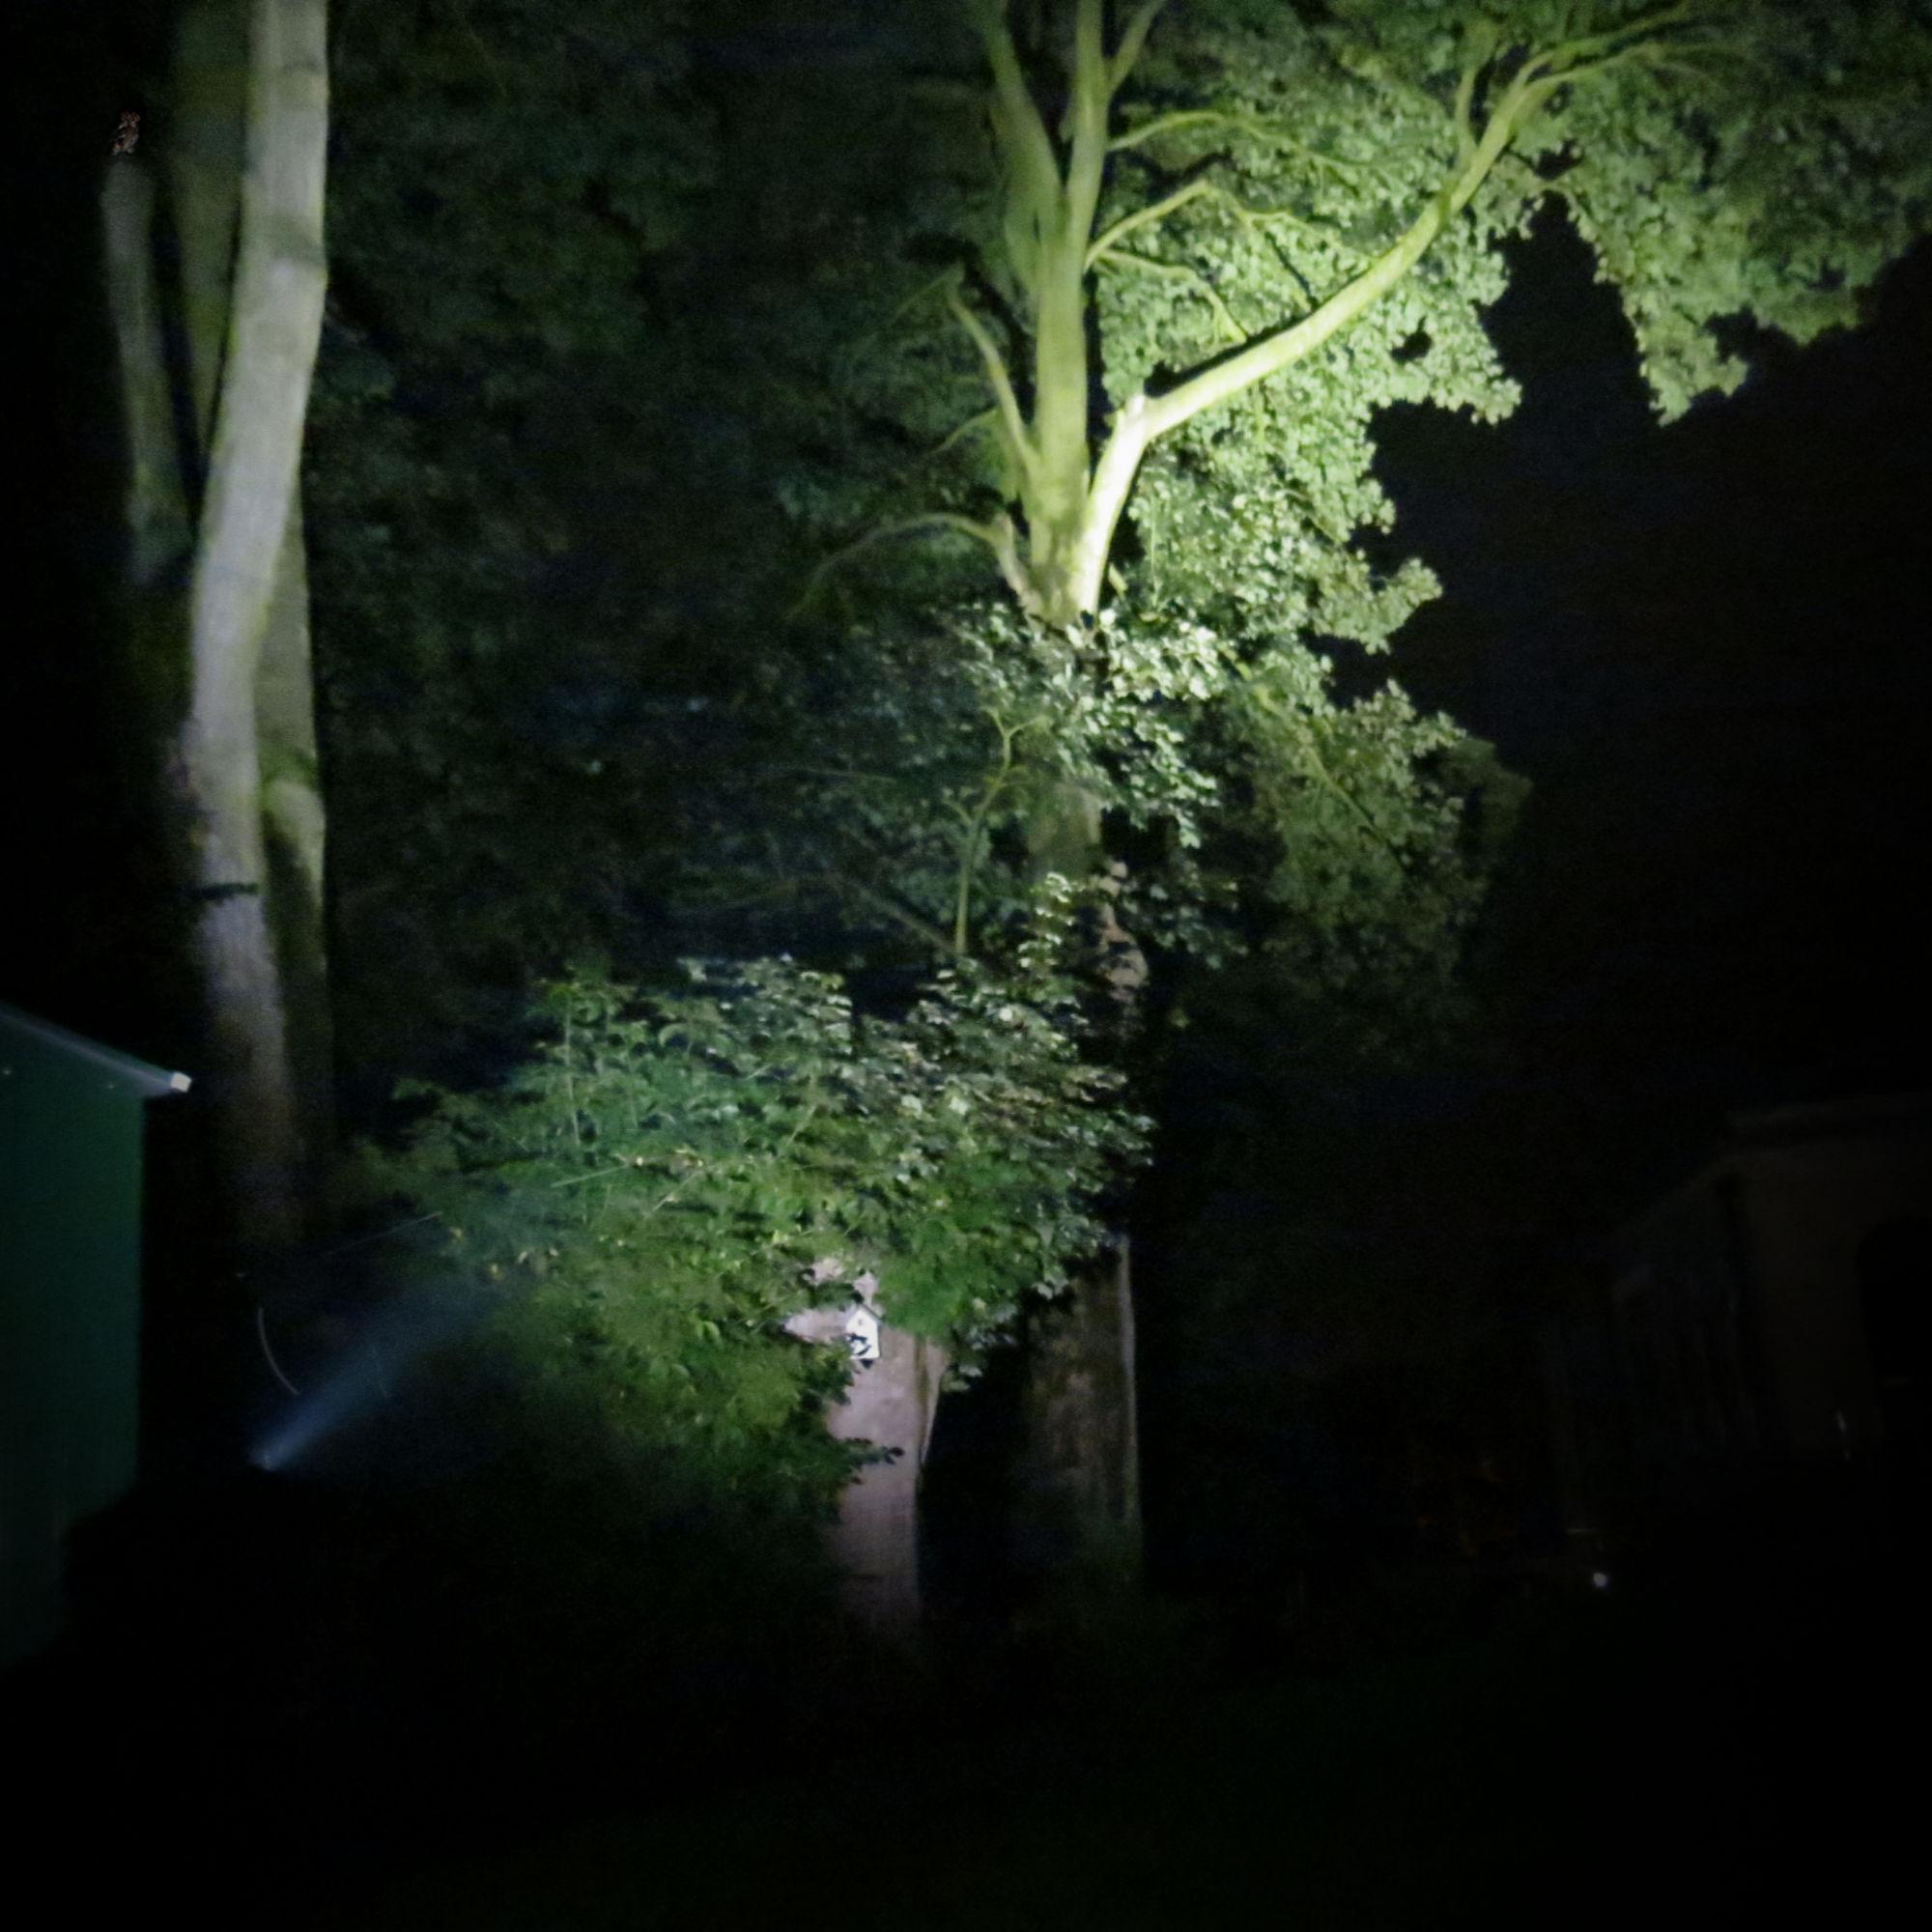 Xtar H3 At Night On Turbo Mode